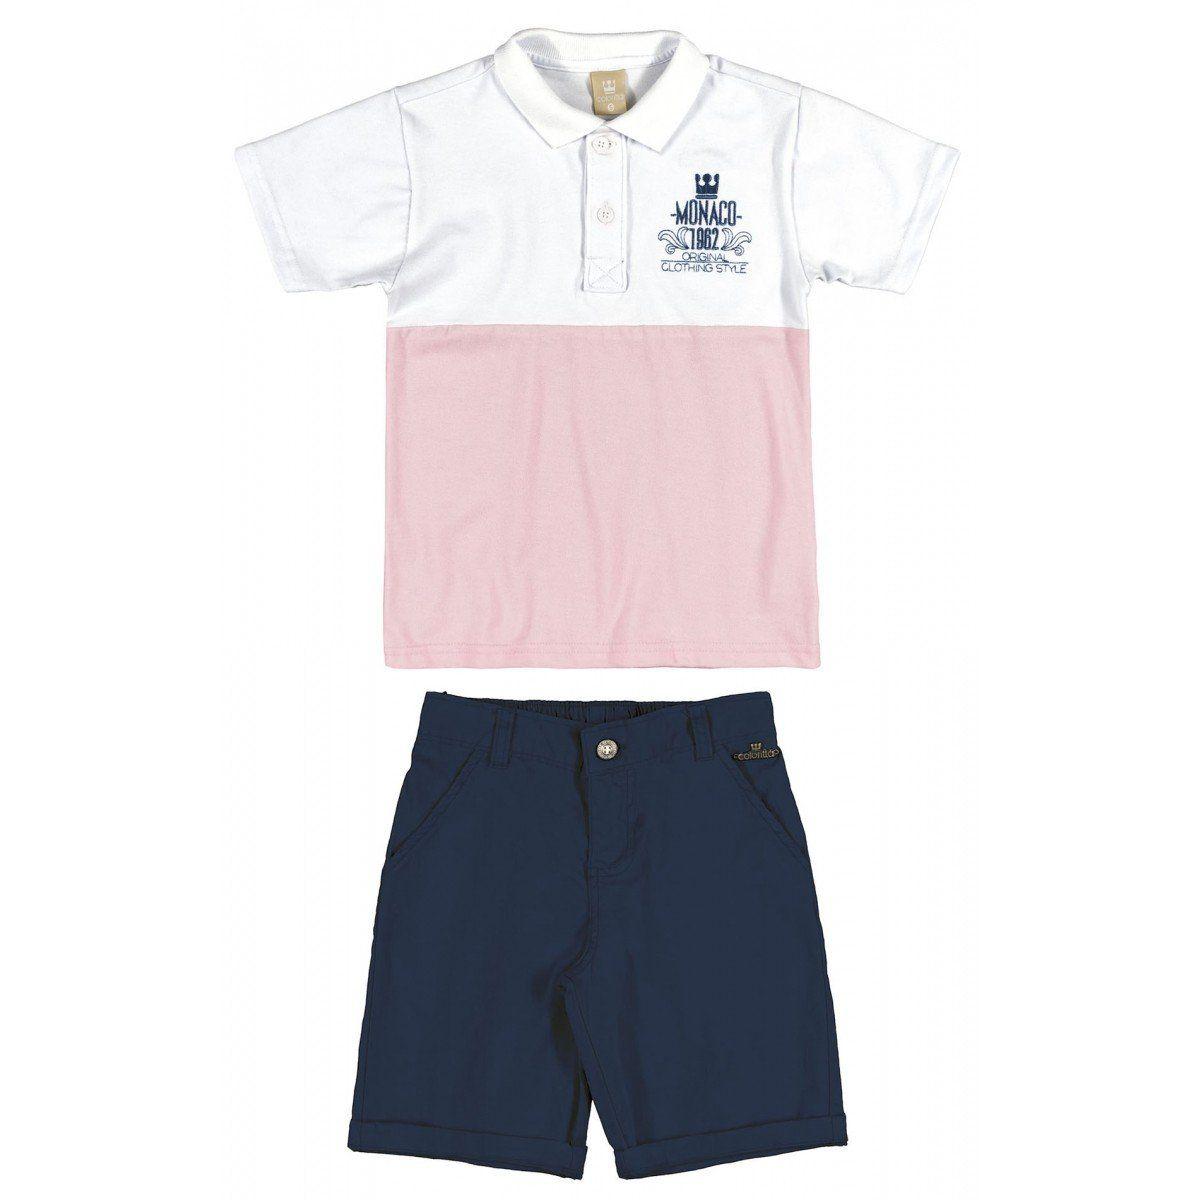 Conjunto Infantil Masculino Rosa Monaco Colorittá